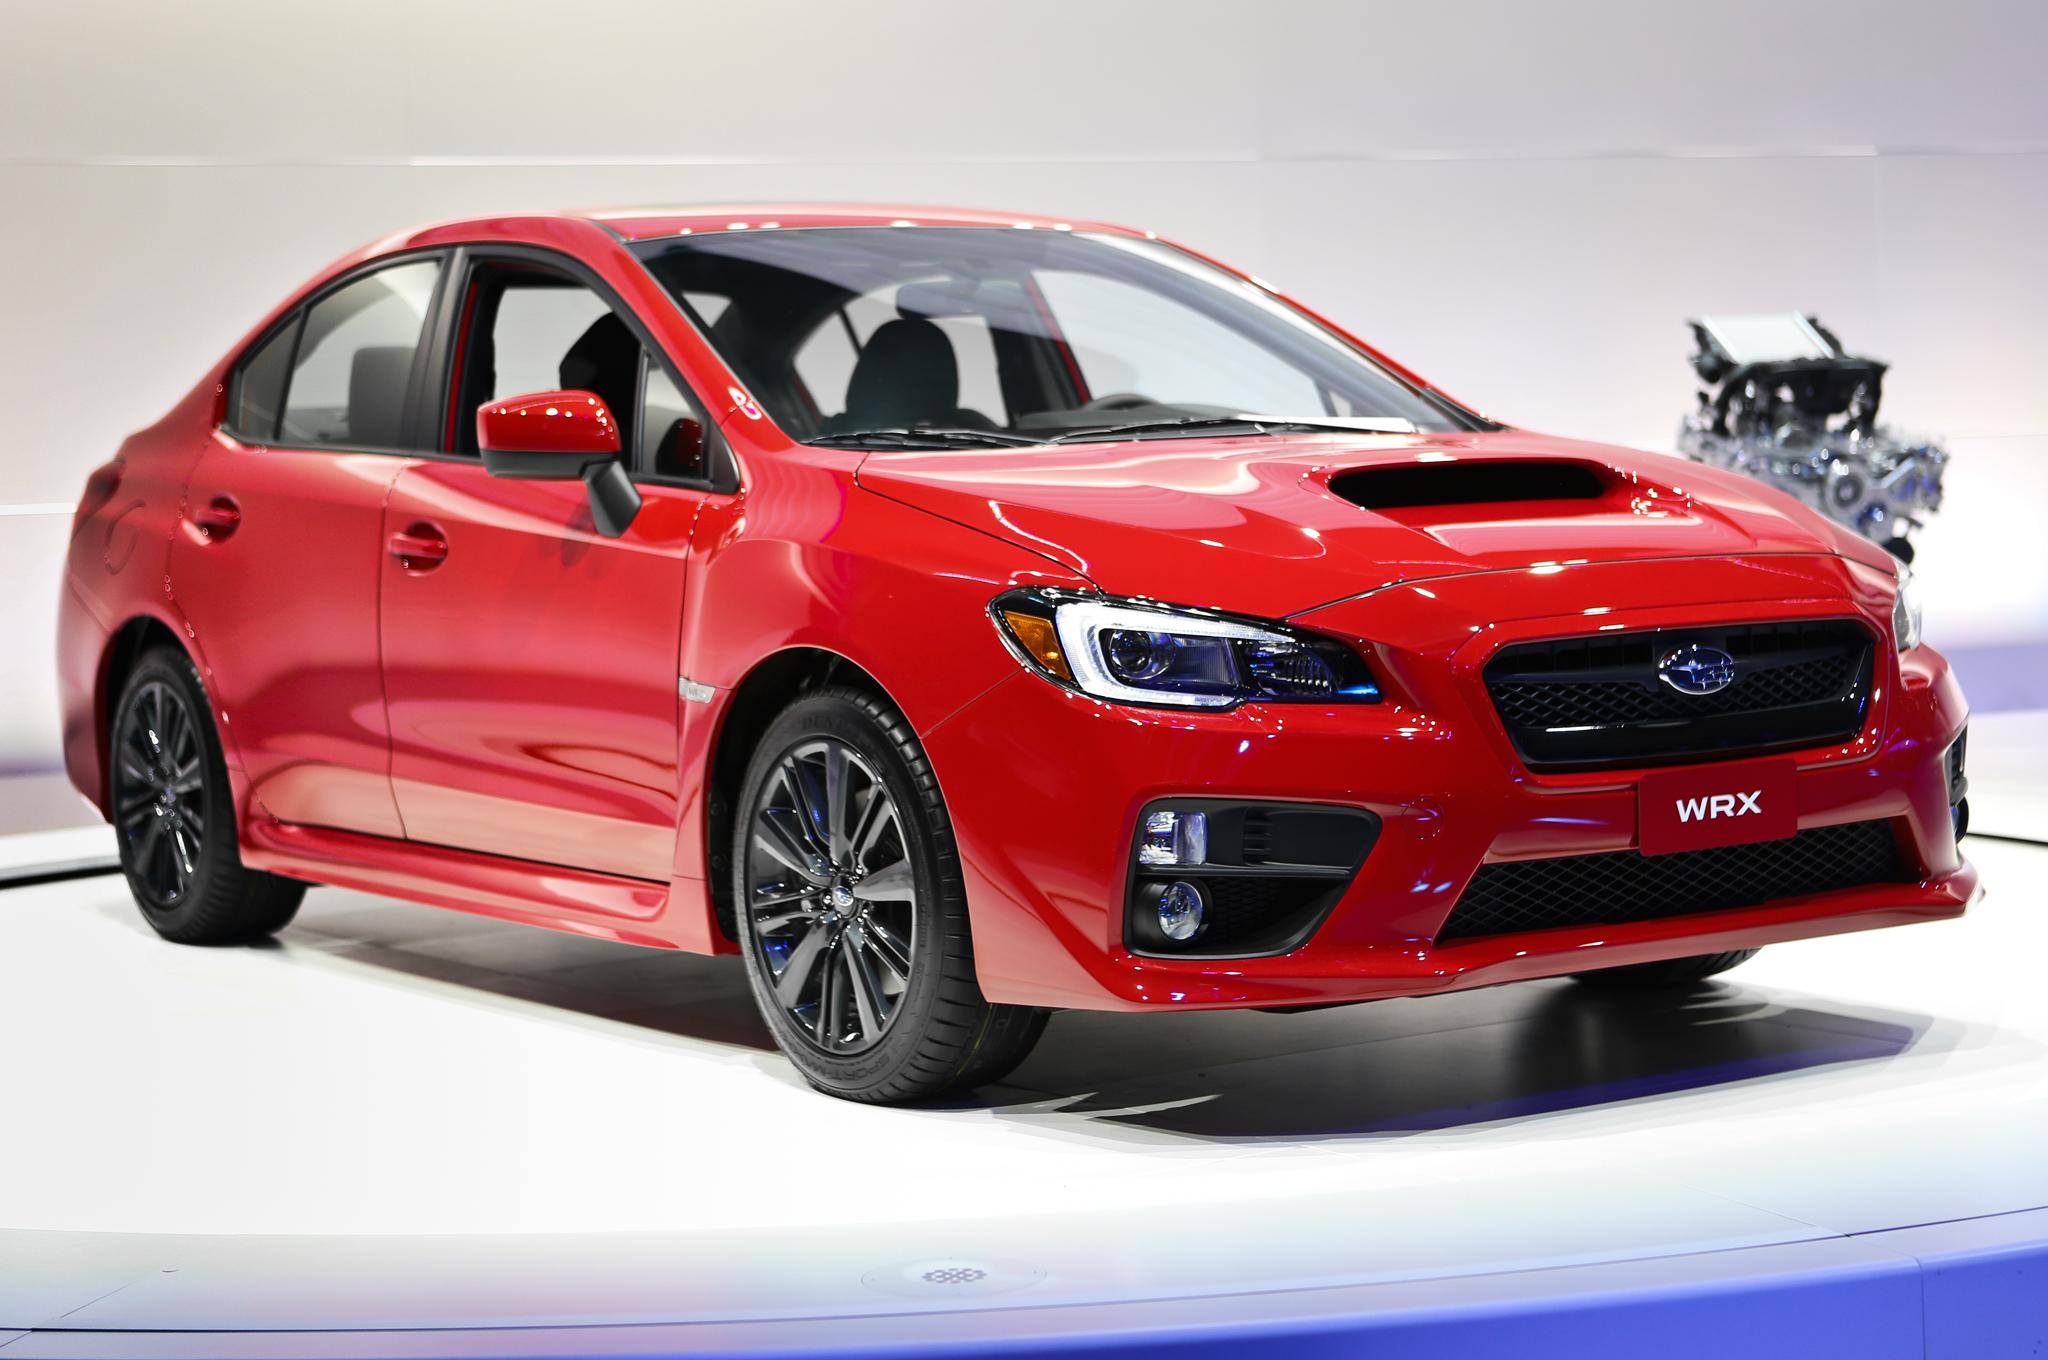 Auto Show: New 2015 Subaru WRX